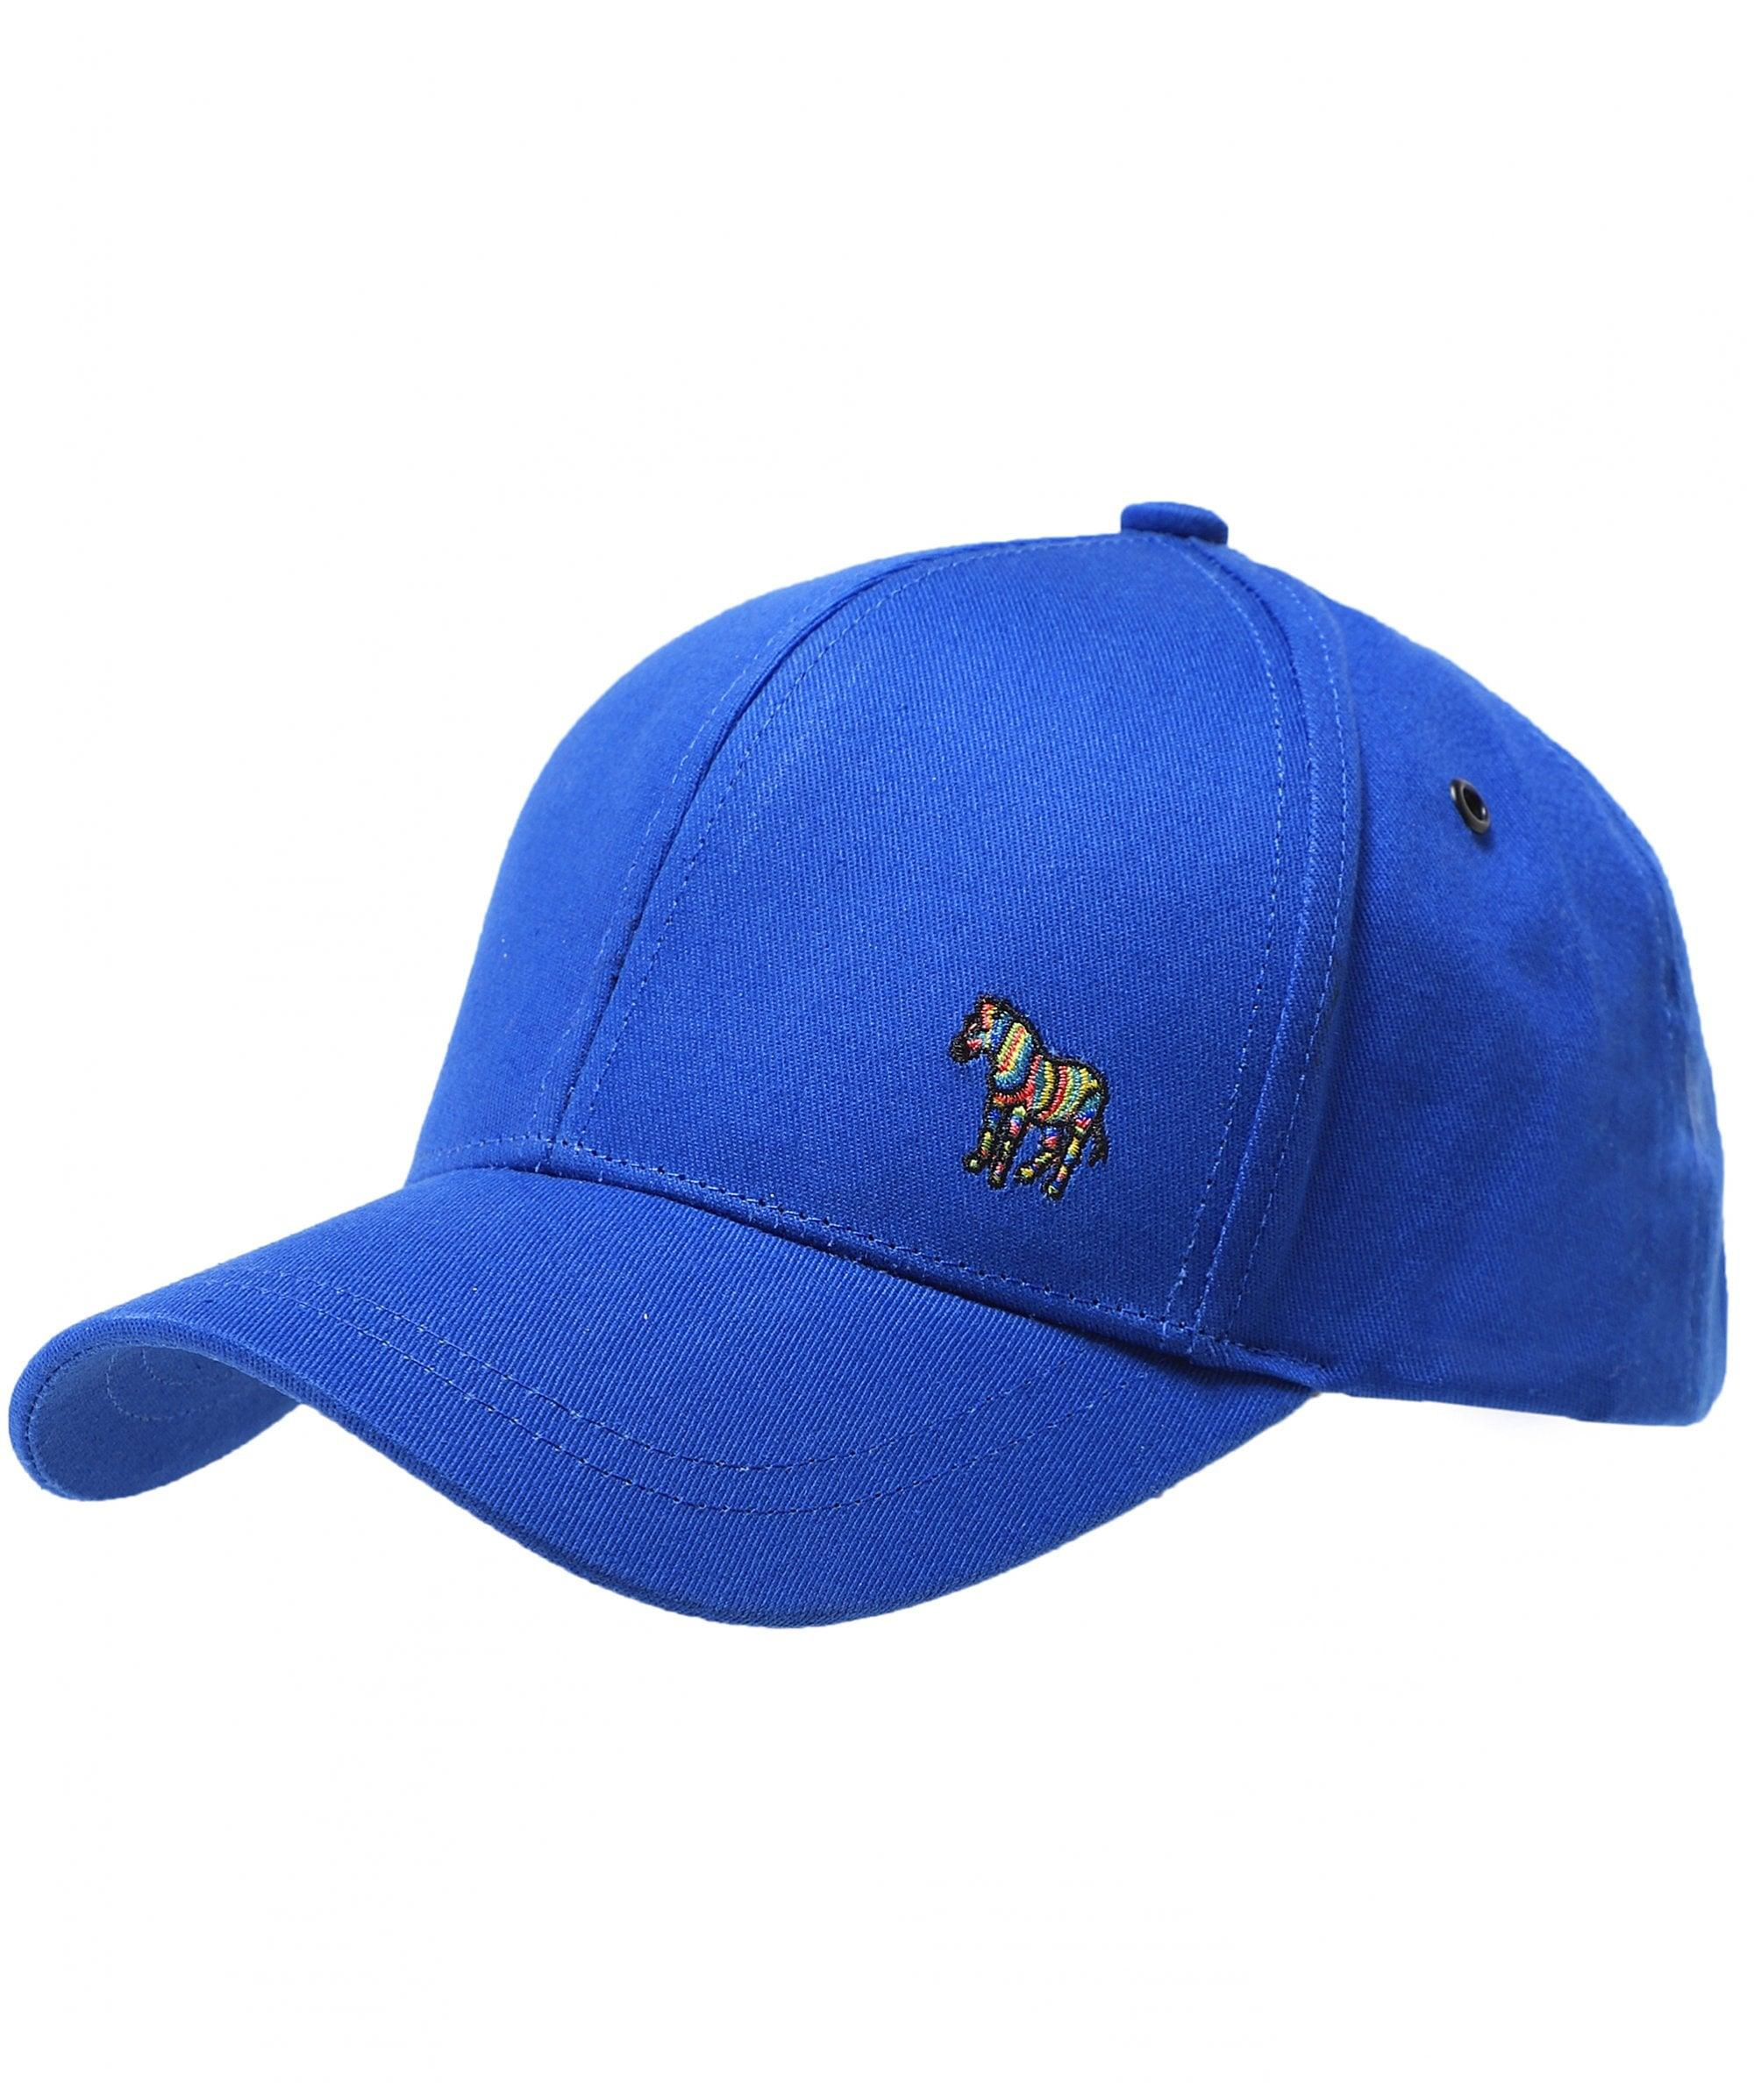 6fd4e9d690d Lyst - Ps By Paul Smith Cotton Zebra Logo Baseball Cap in Blue for Men